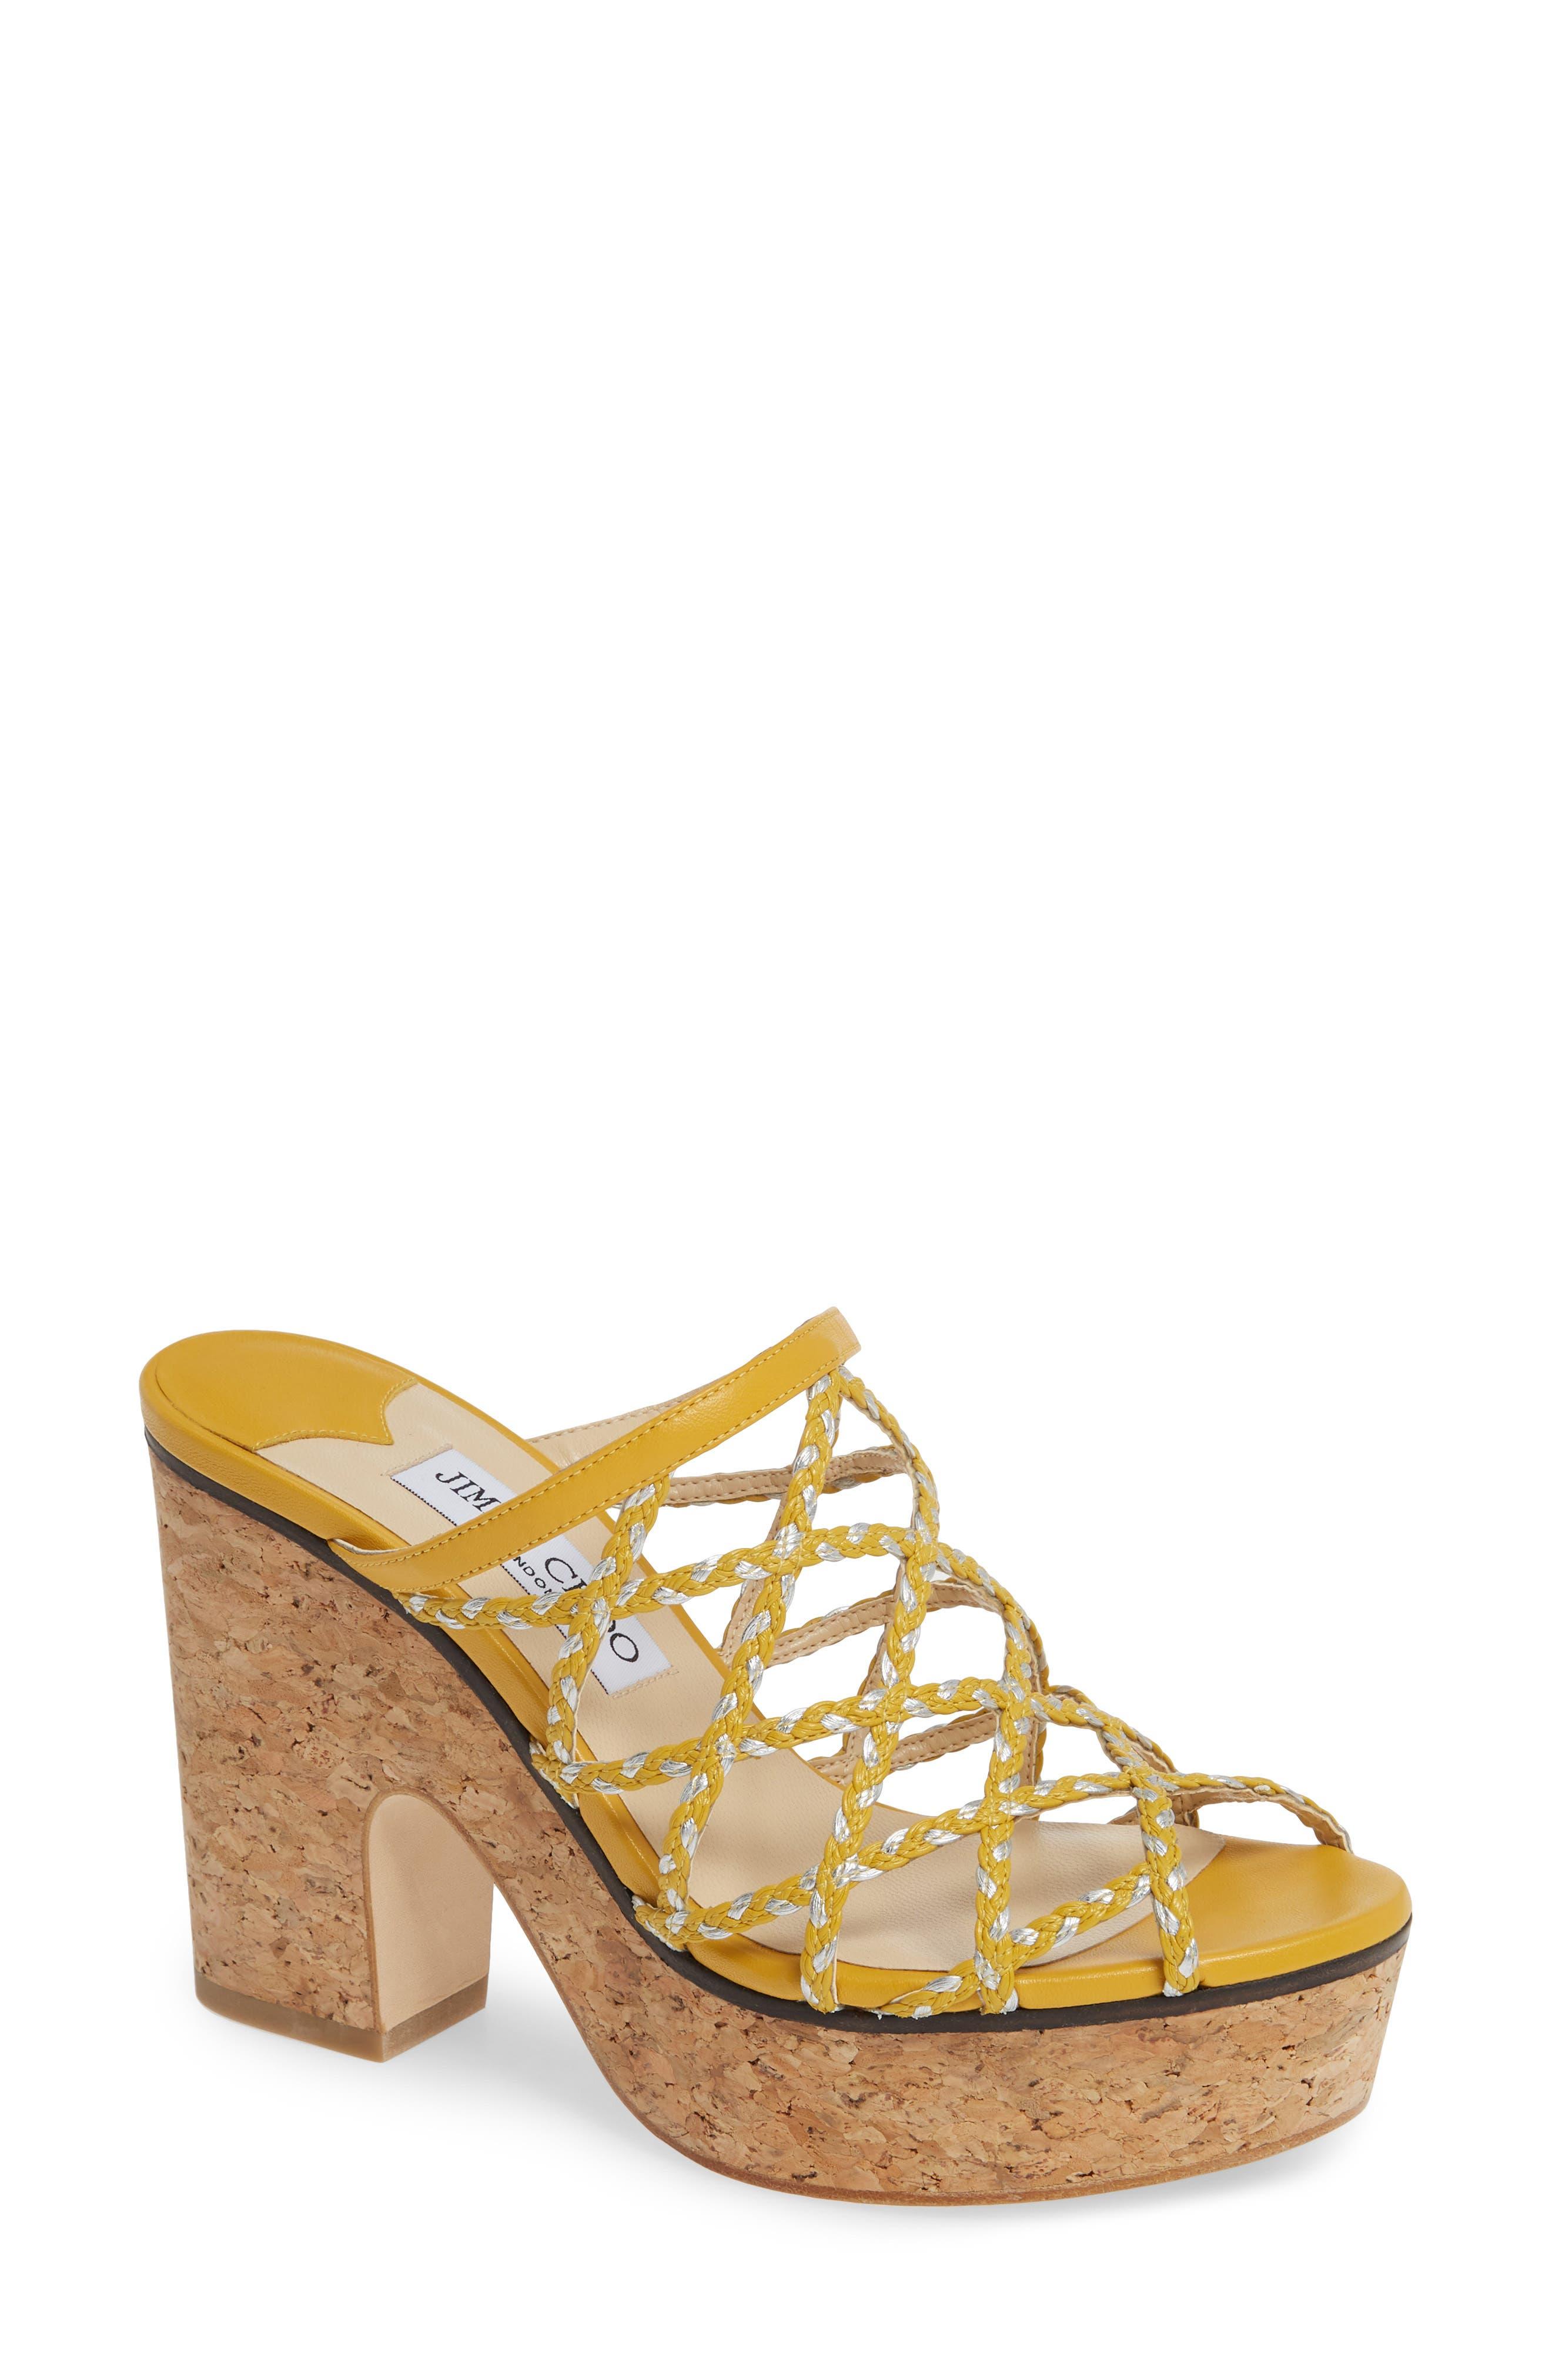 Jimmy Choo Dallina Platform Slide Sandal, Yellow